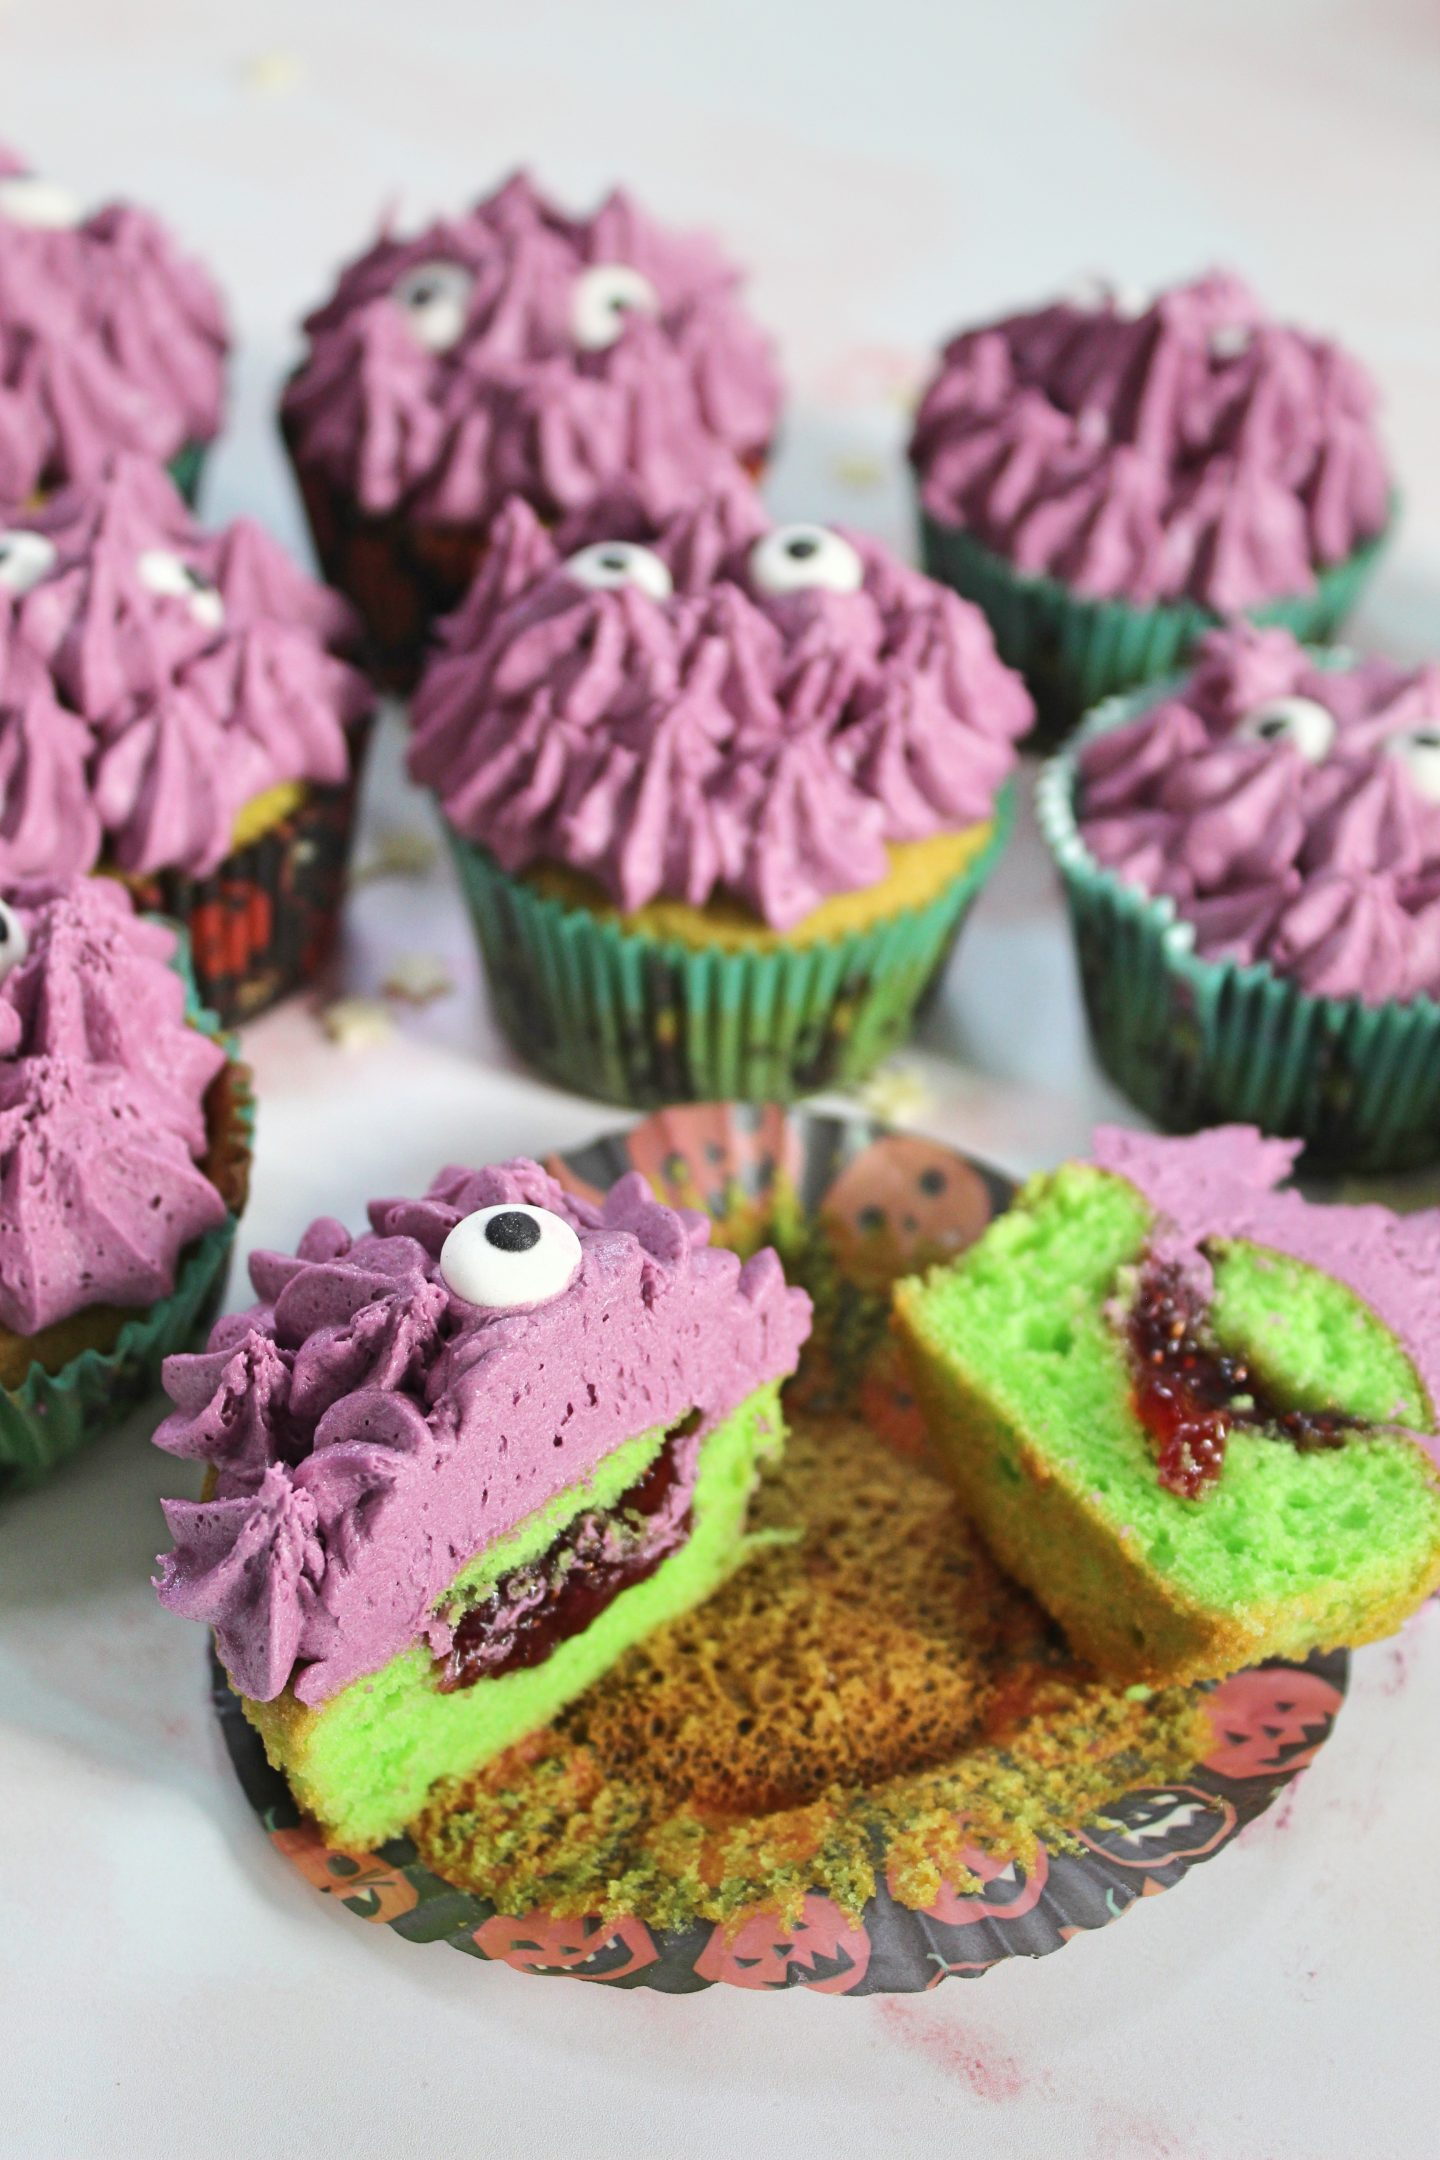 GLUTEN FREE MONSTER CUPCAKES HALLOWEEN CAKES 103